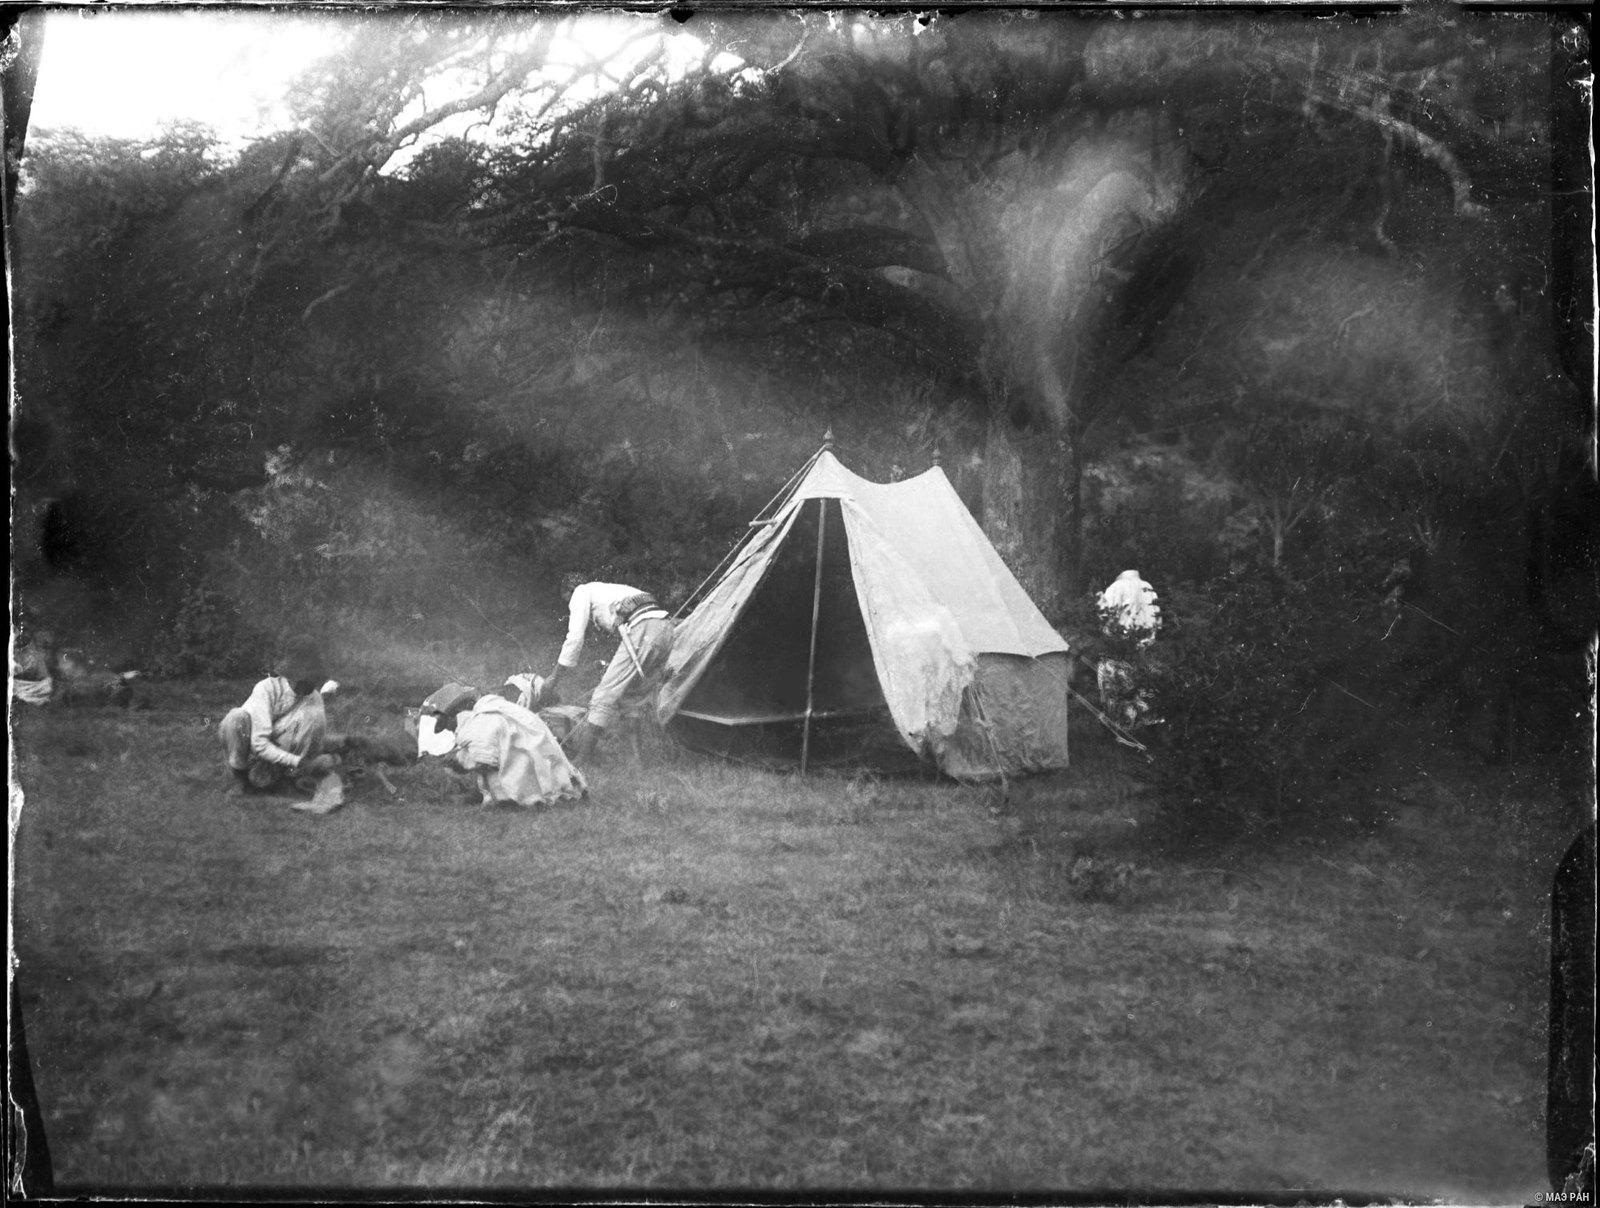 17. Установка палатки